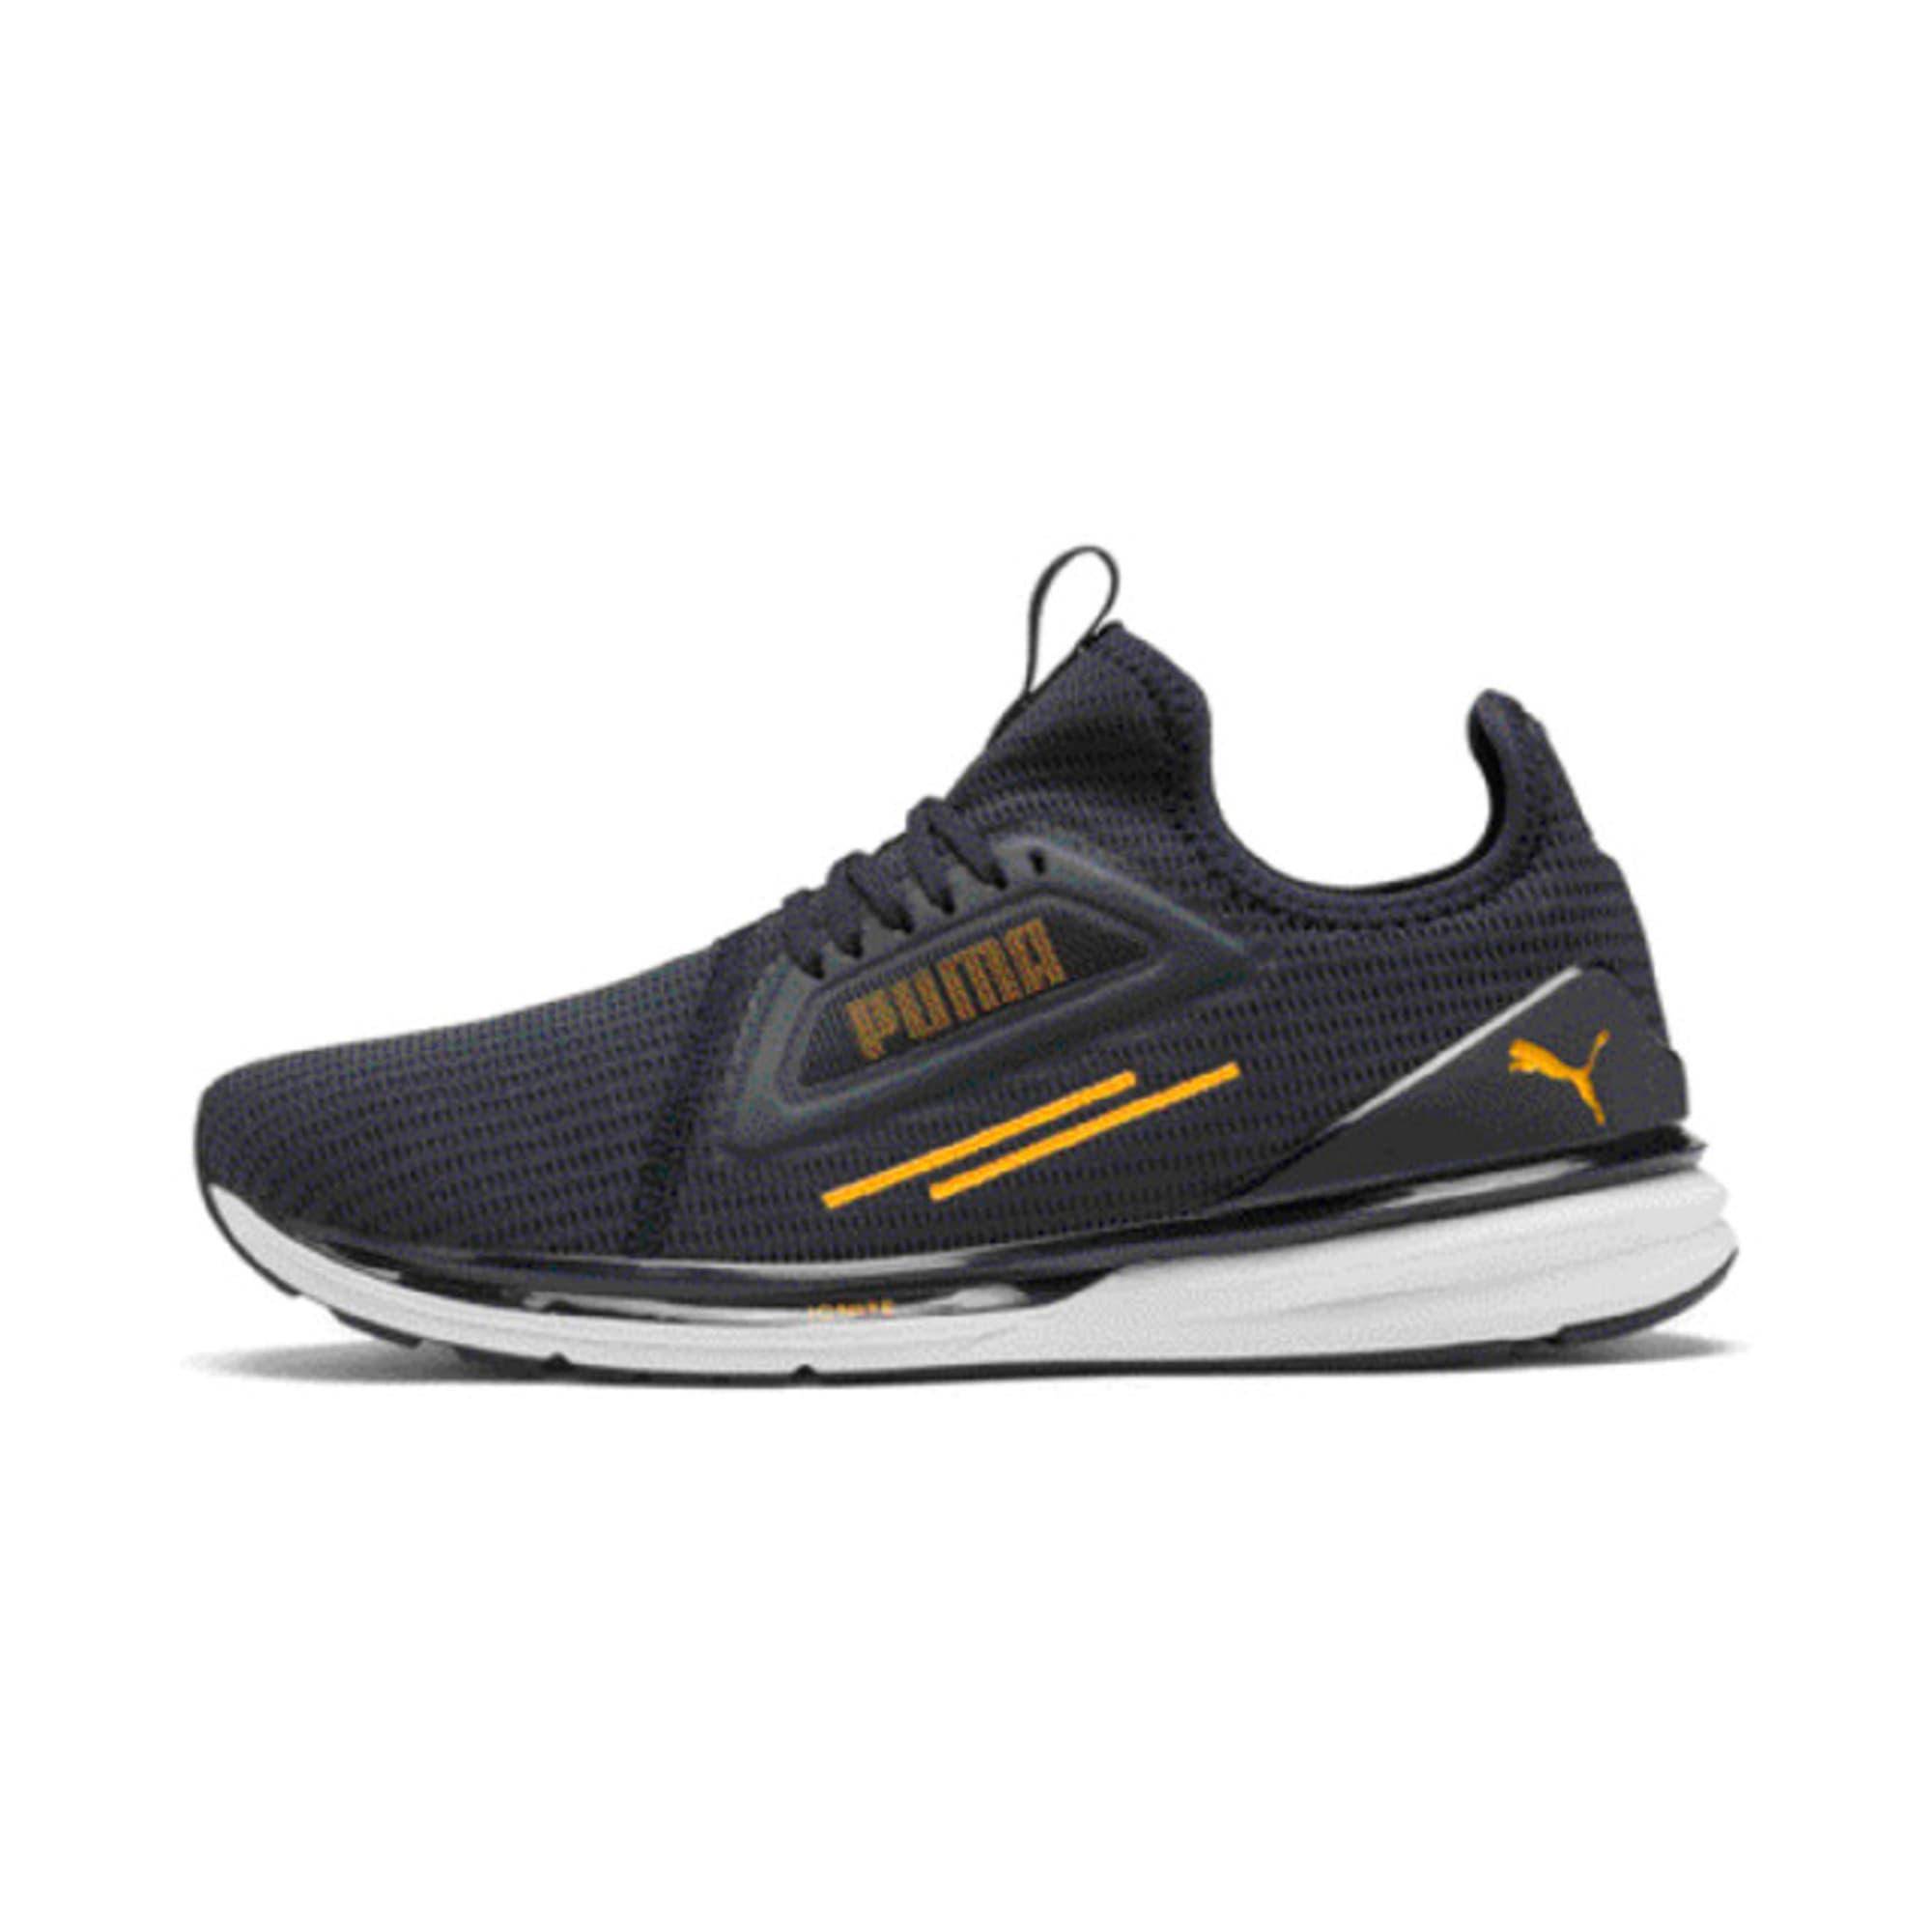 Thumbnail 1 of IGNITE Limitless Lean Running Shoes, Peacoat-Orange Alert, medium-IND